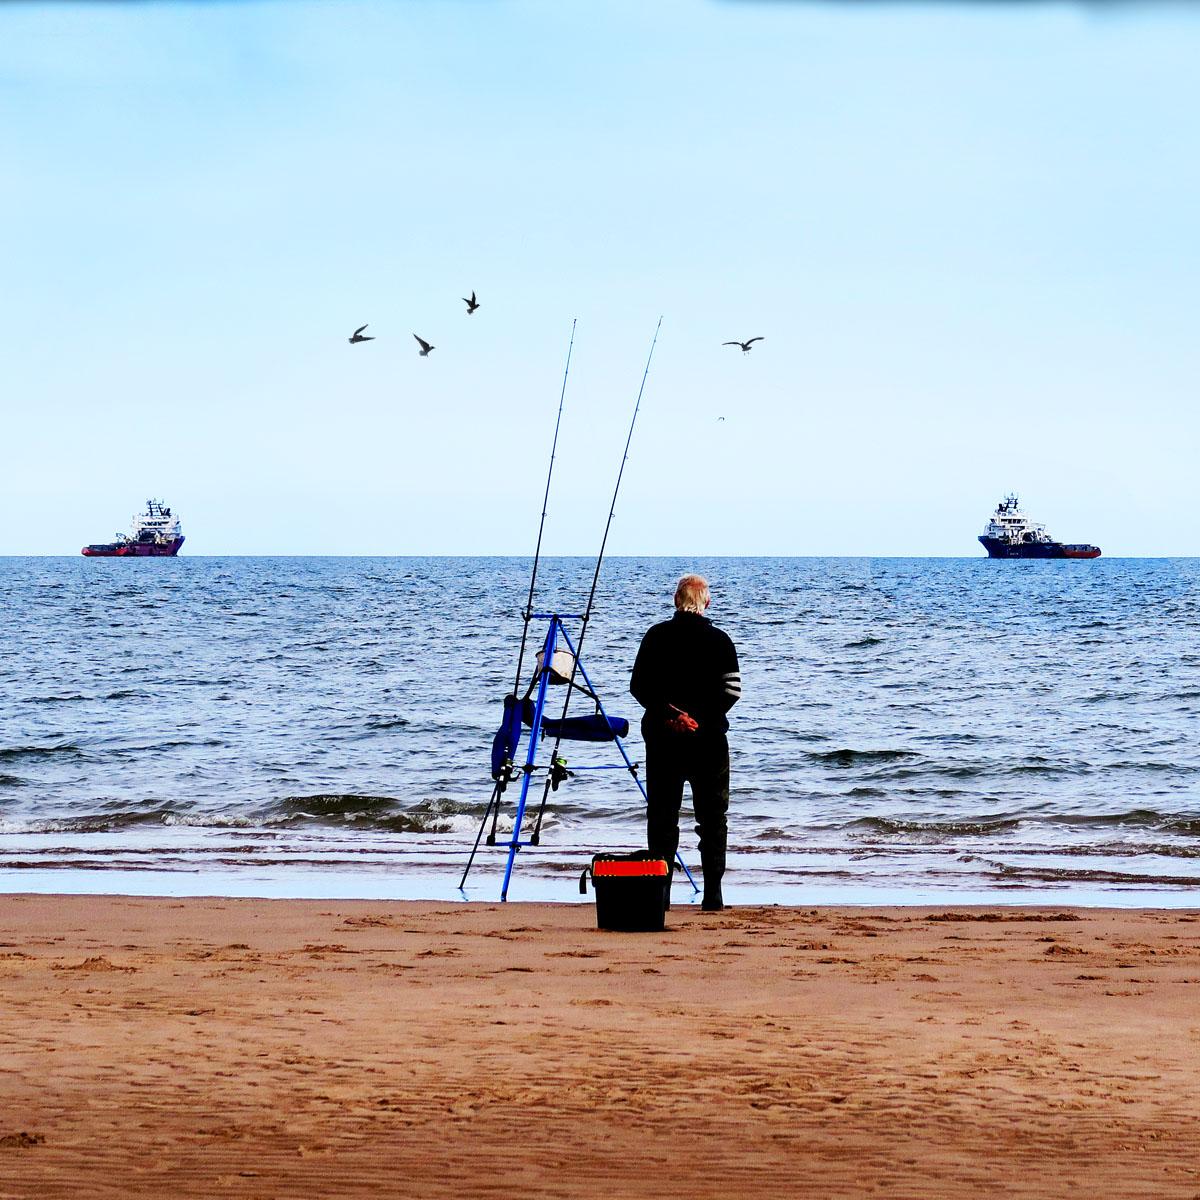 Thefisherman-04